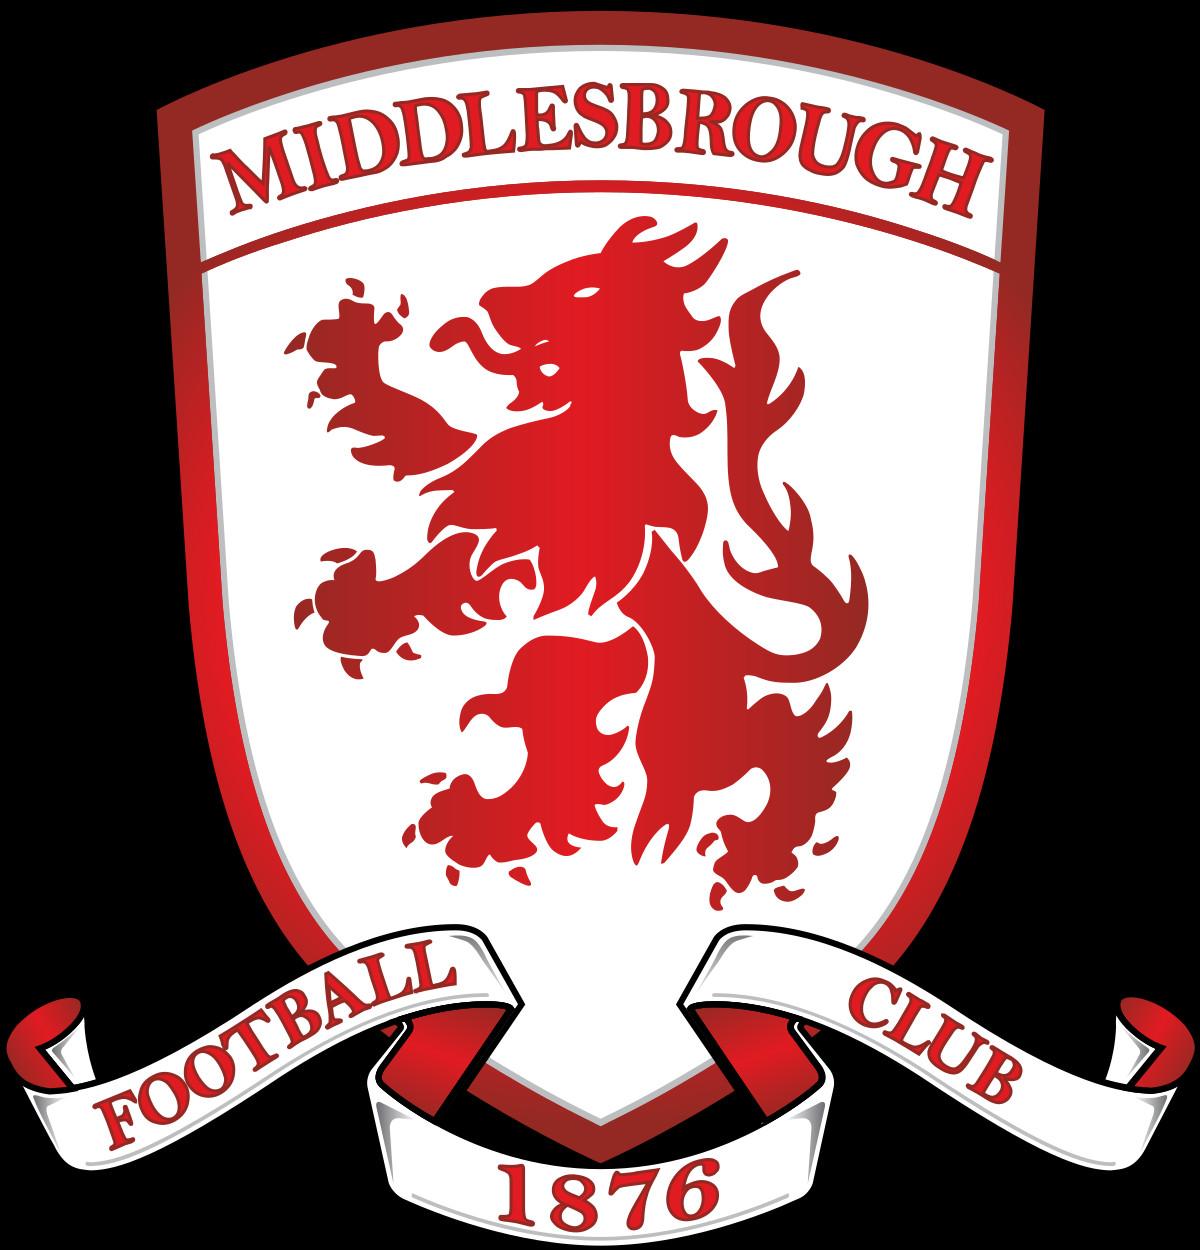 Barnsley 1-0 Middlesbrough